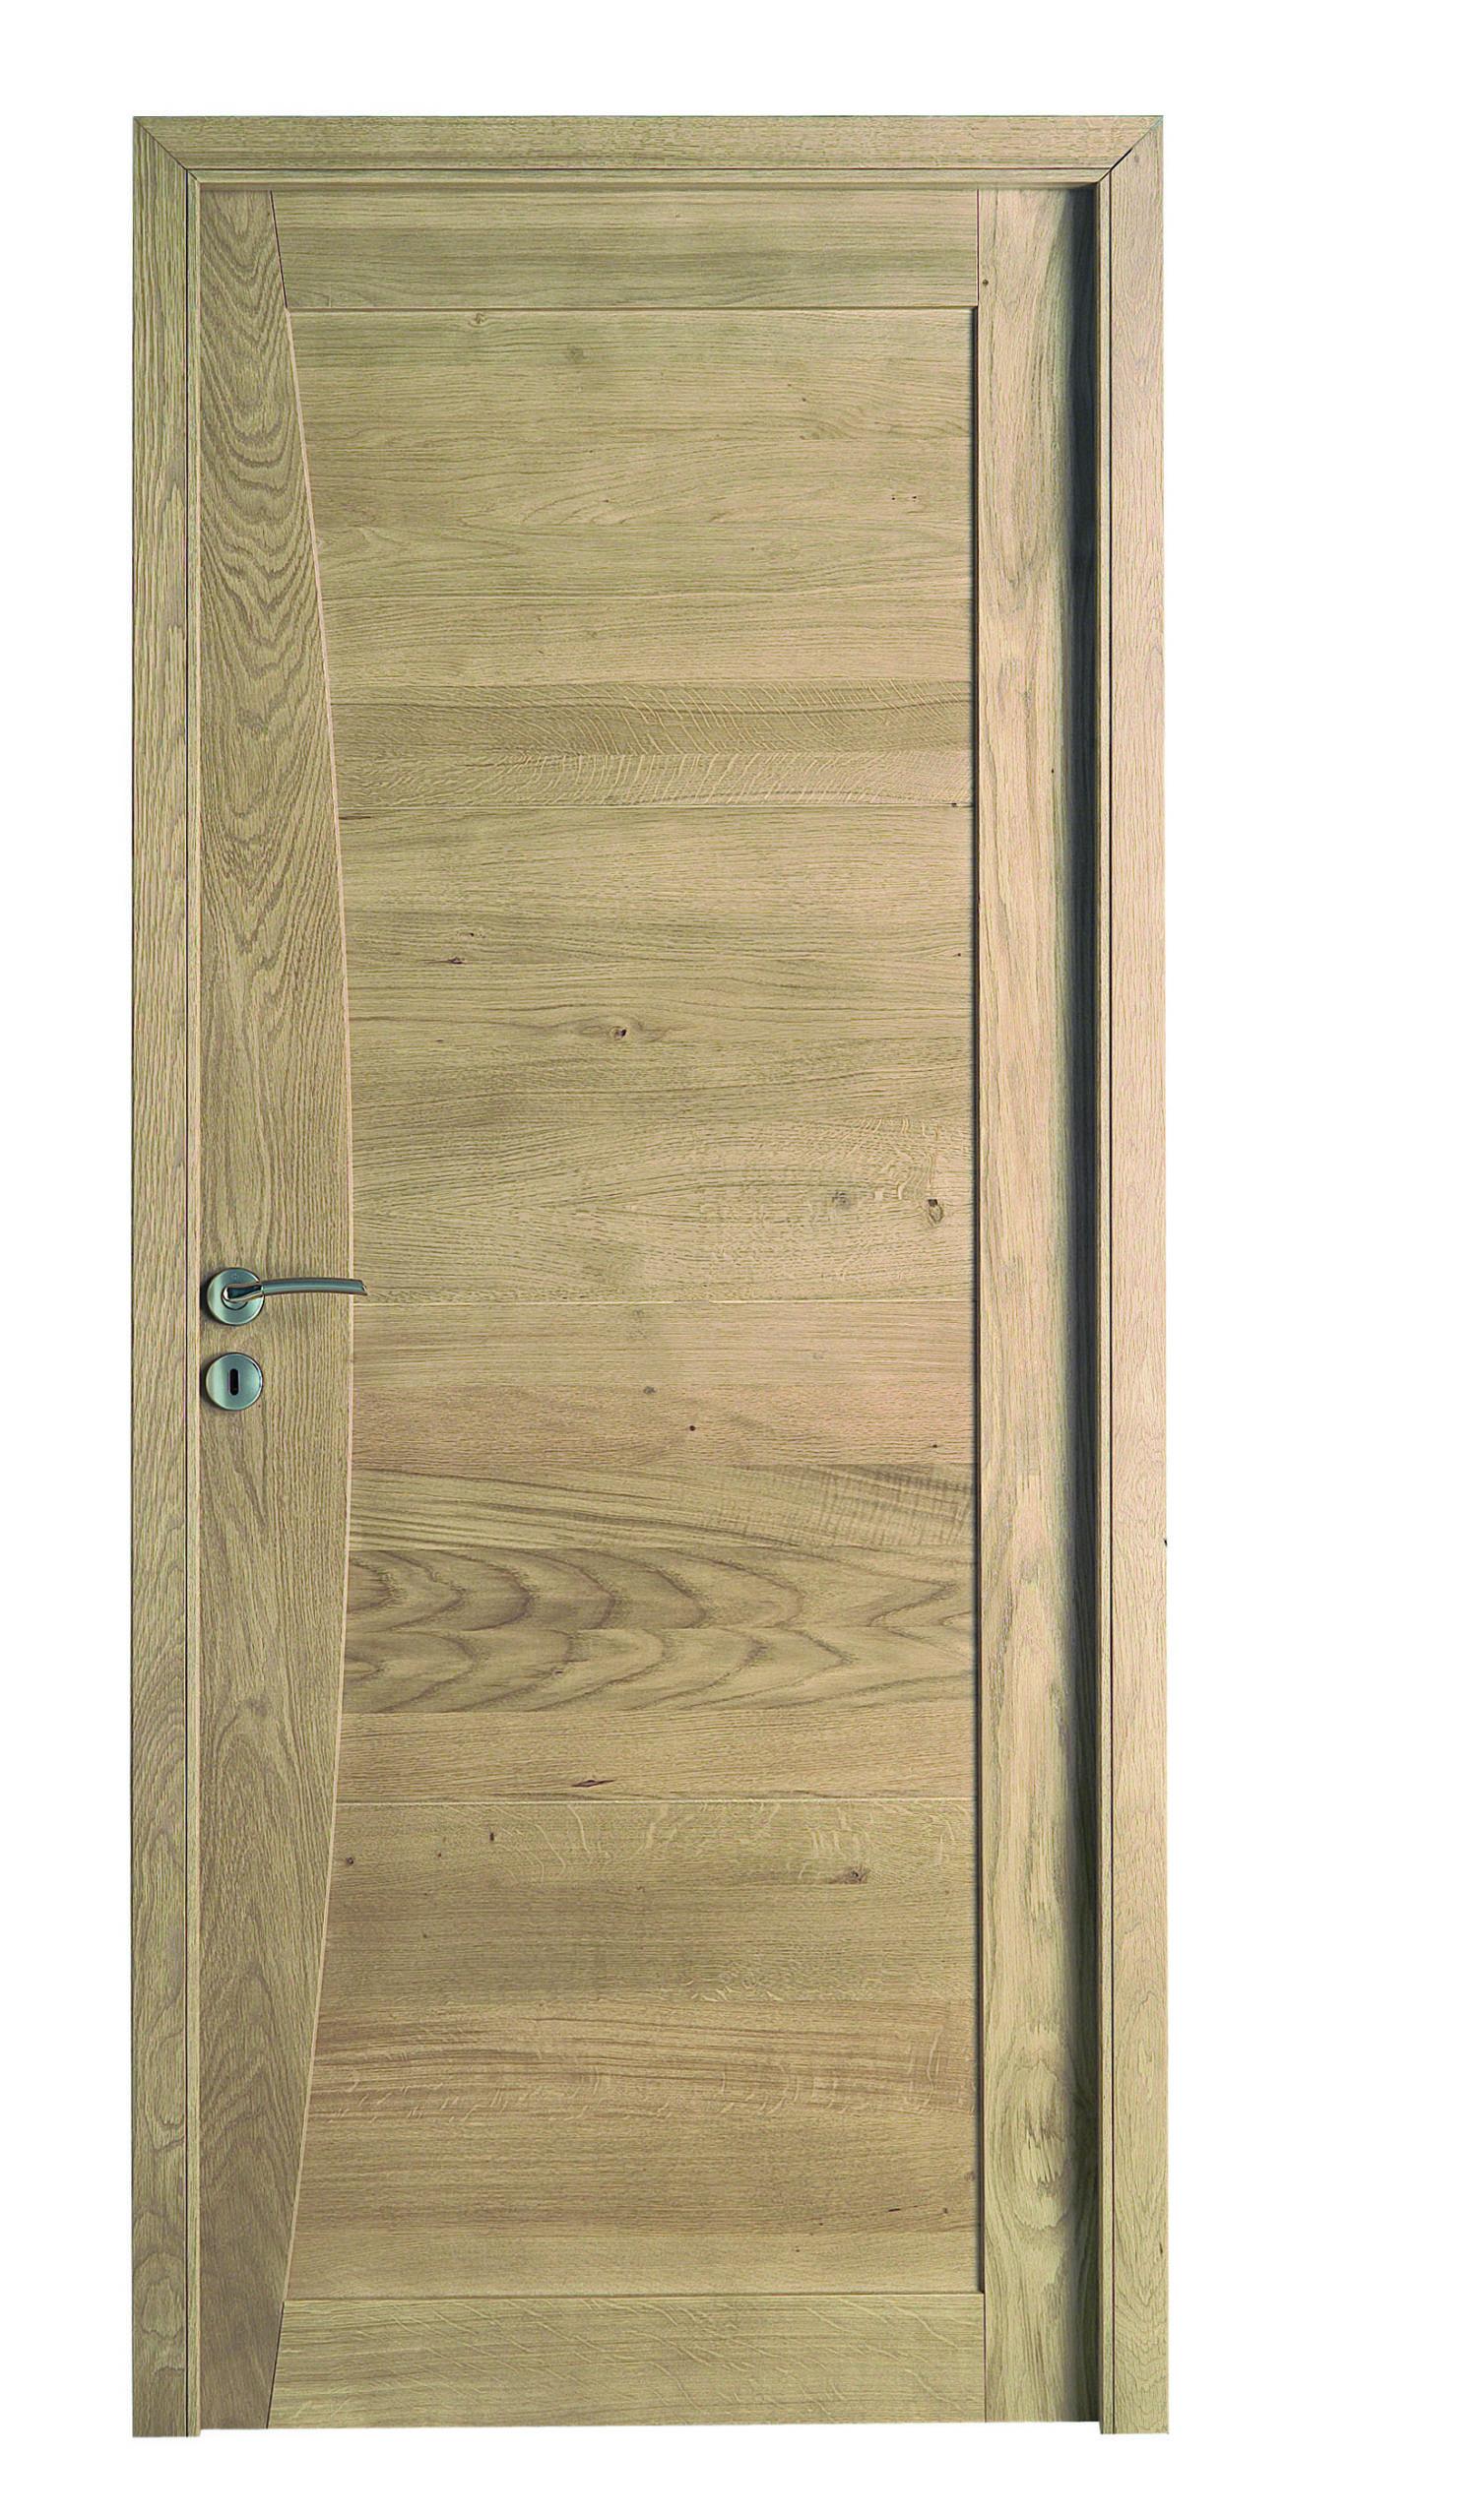 Porte intérieure Mistral design